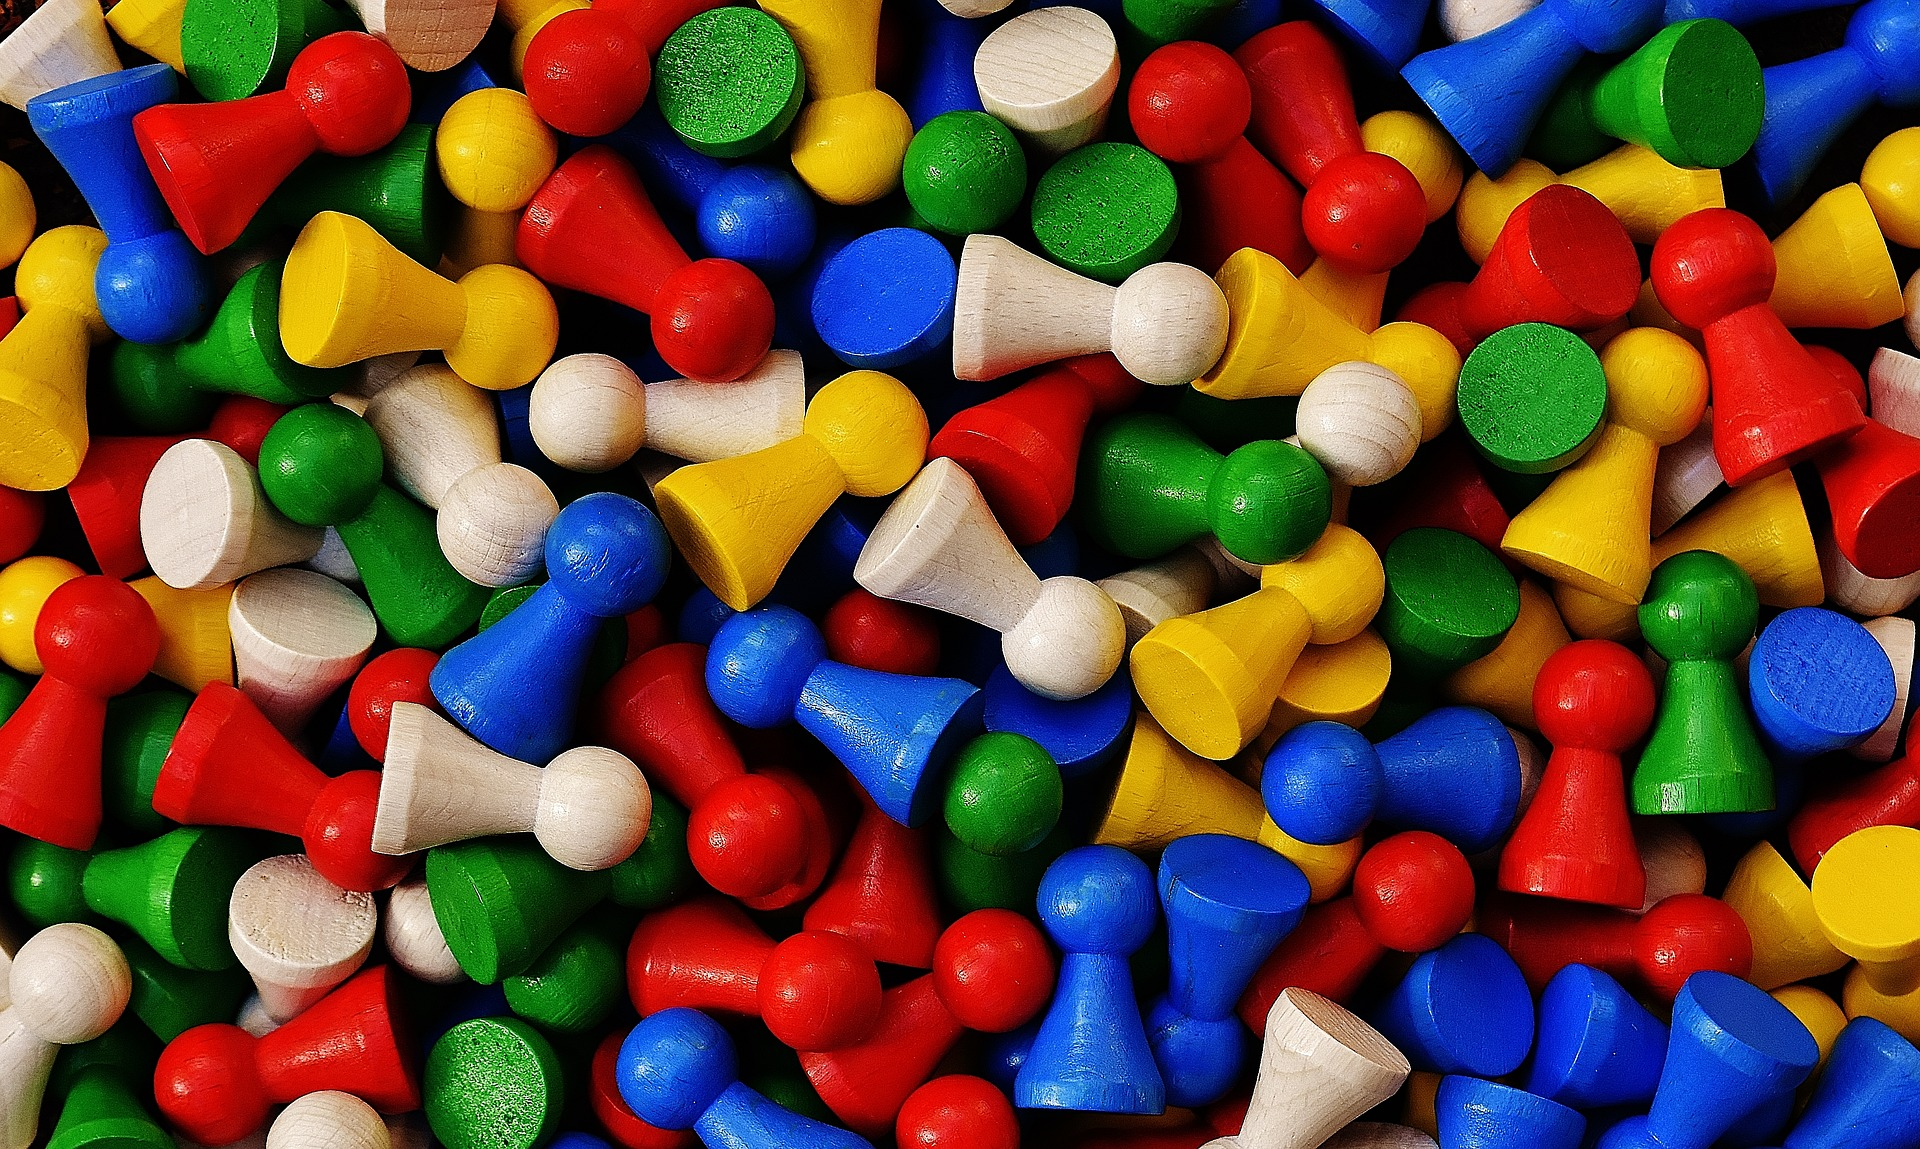 gekleurde pionnen, speelgoed